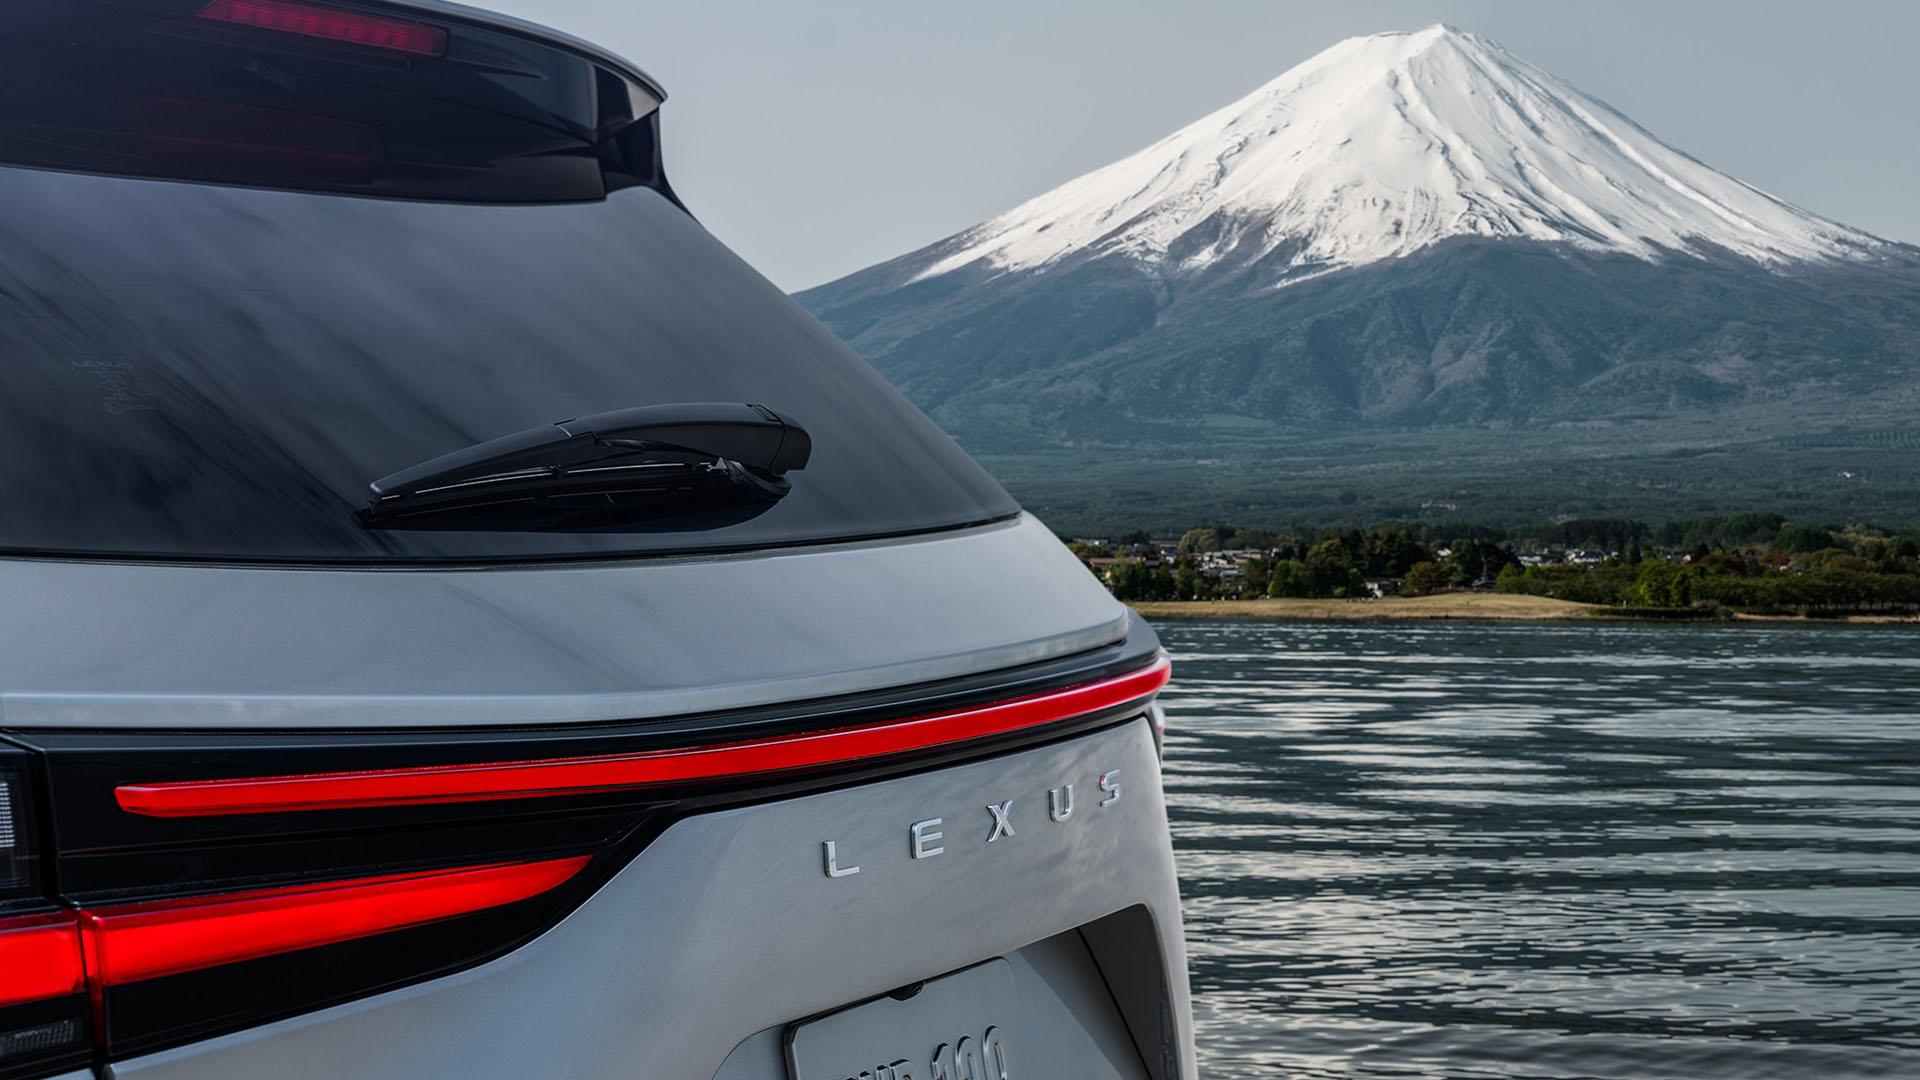 Lexus Yeni Nesil NX SUV'un Dünya Prömiyerini gallery01